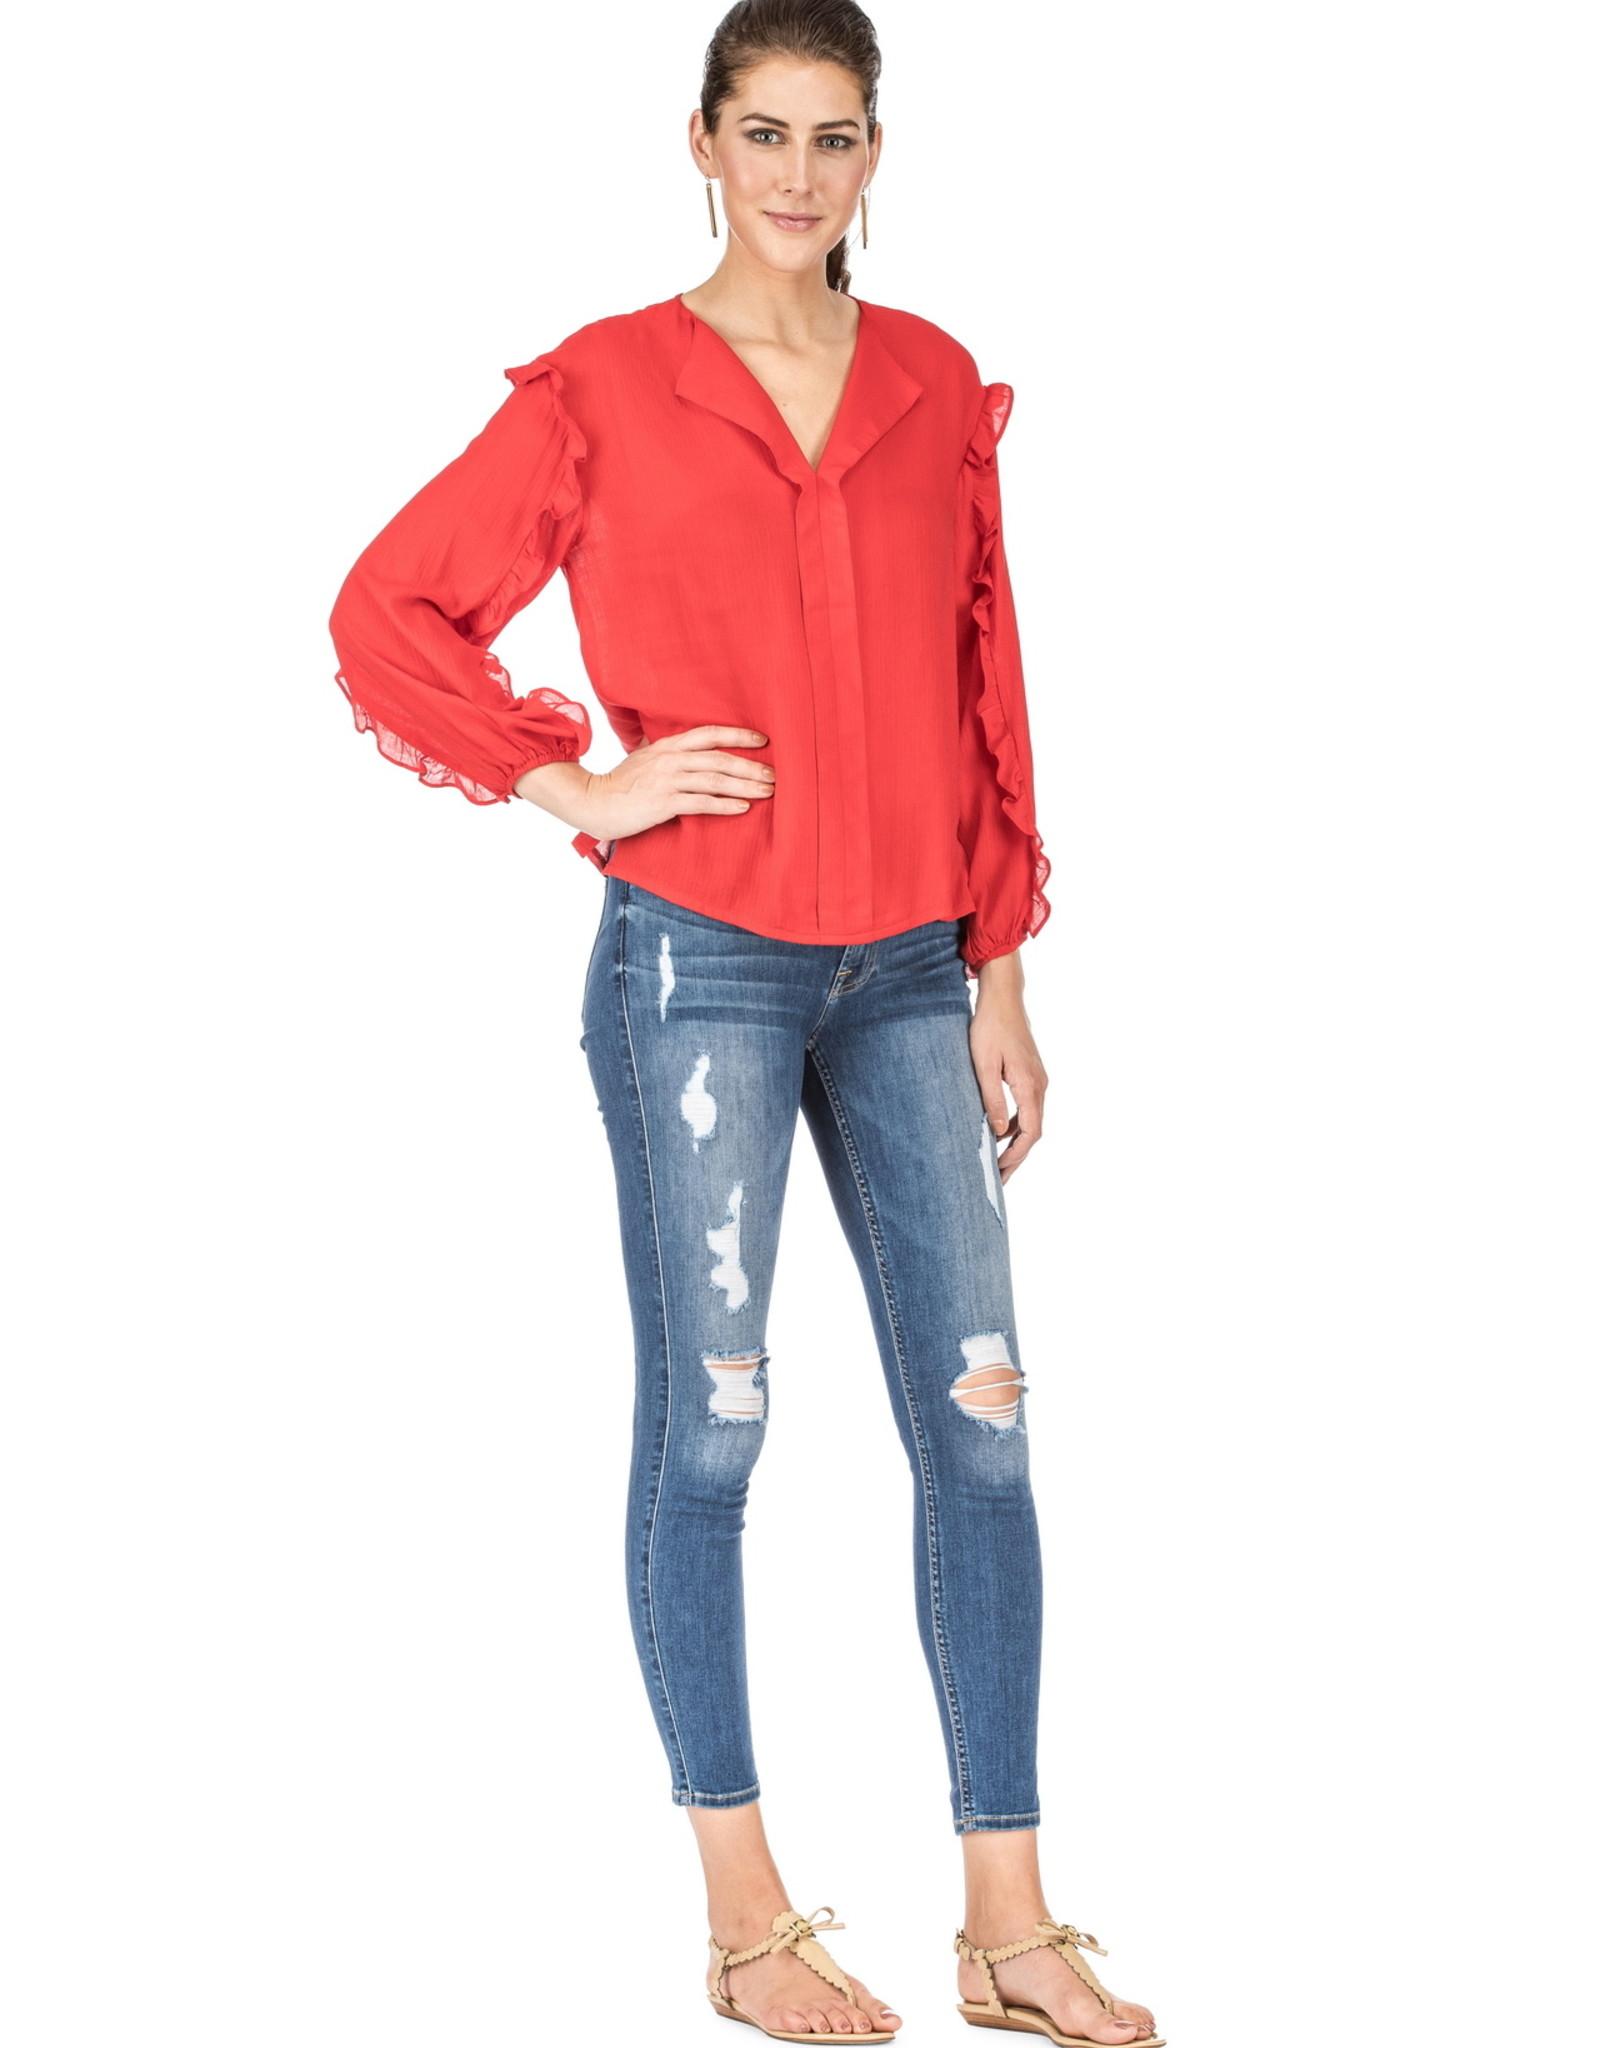 Jade Red Ruffle Sleeved Top